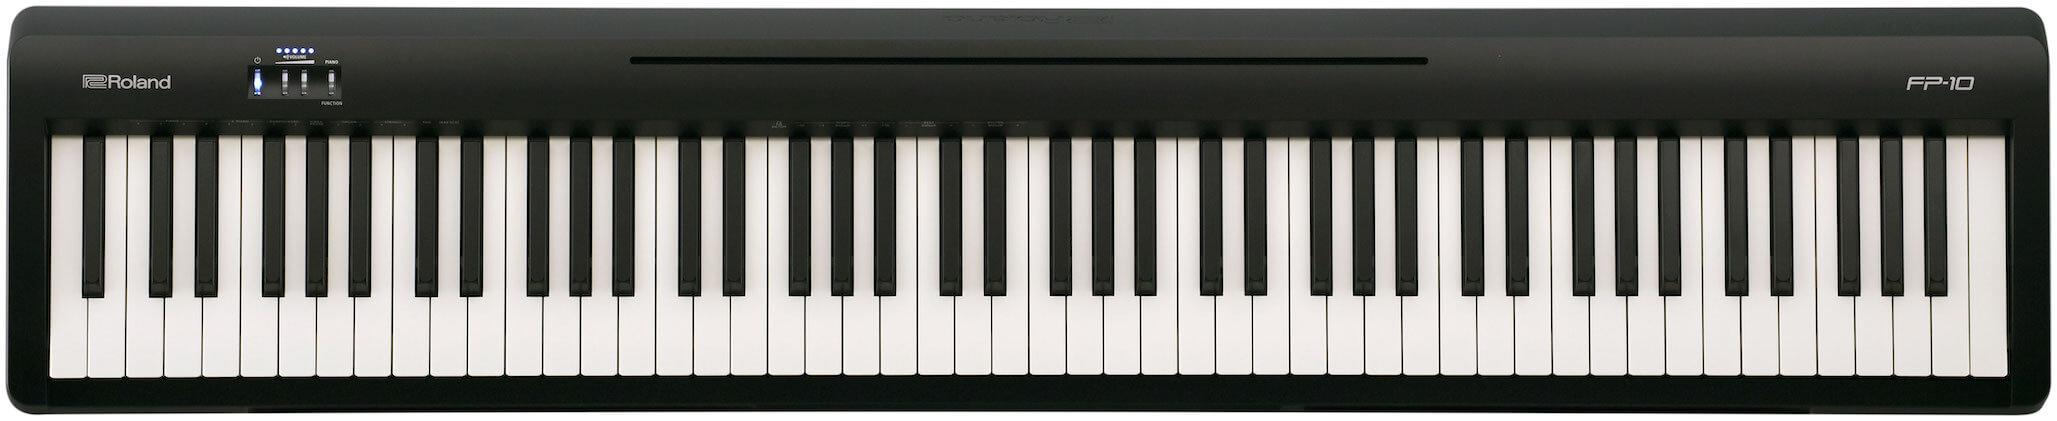 playing piano on a keyboard